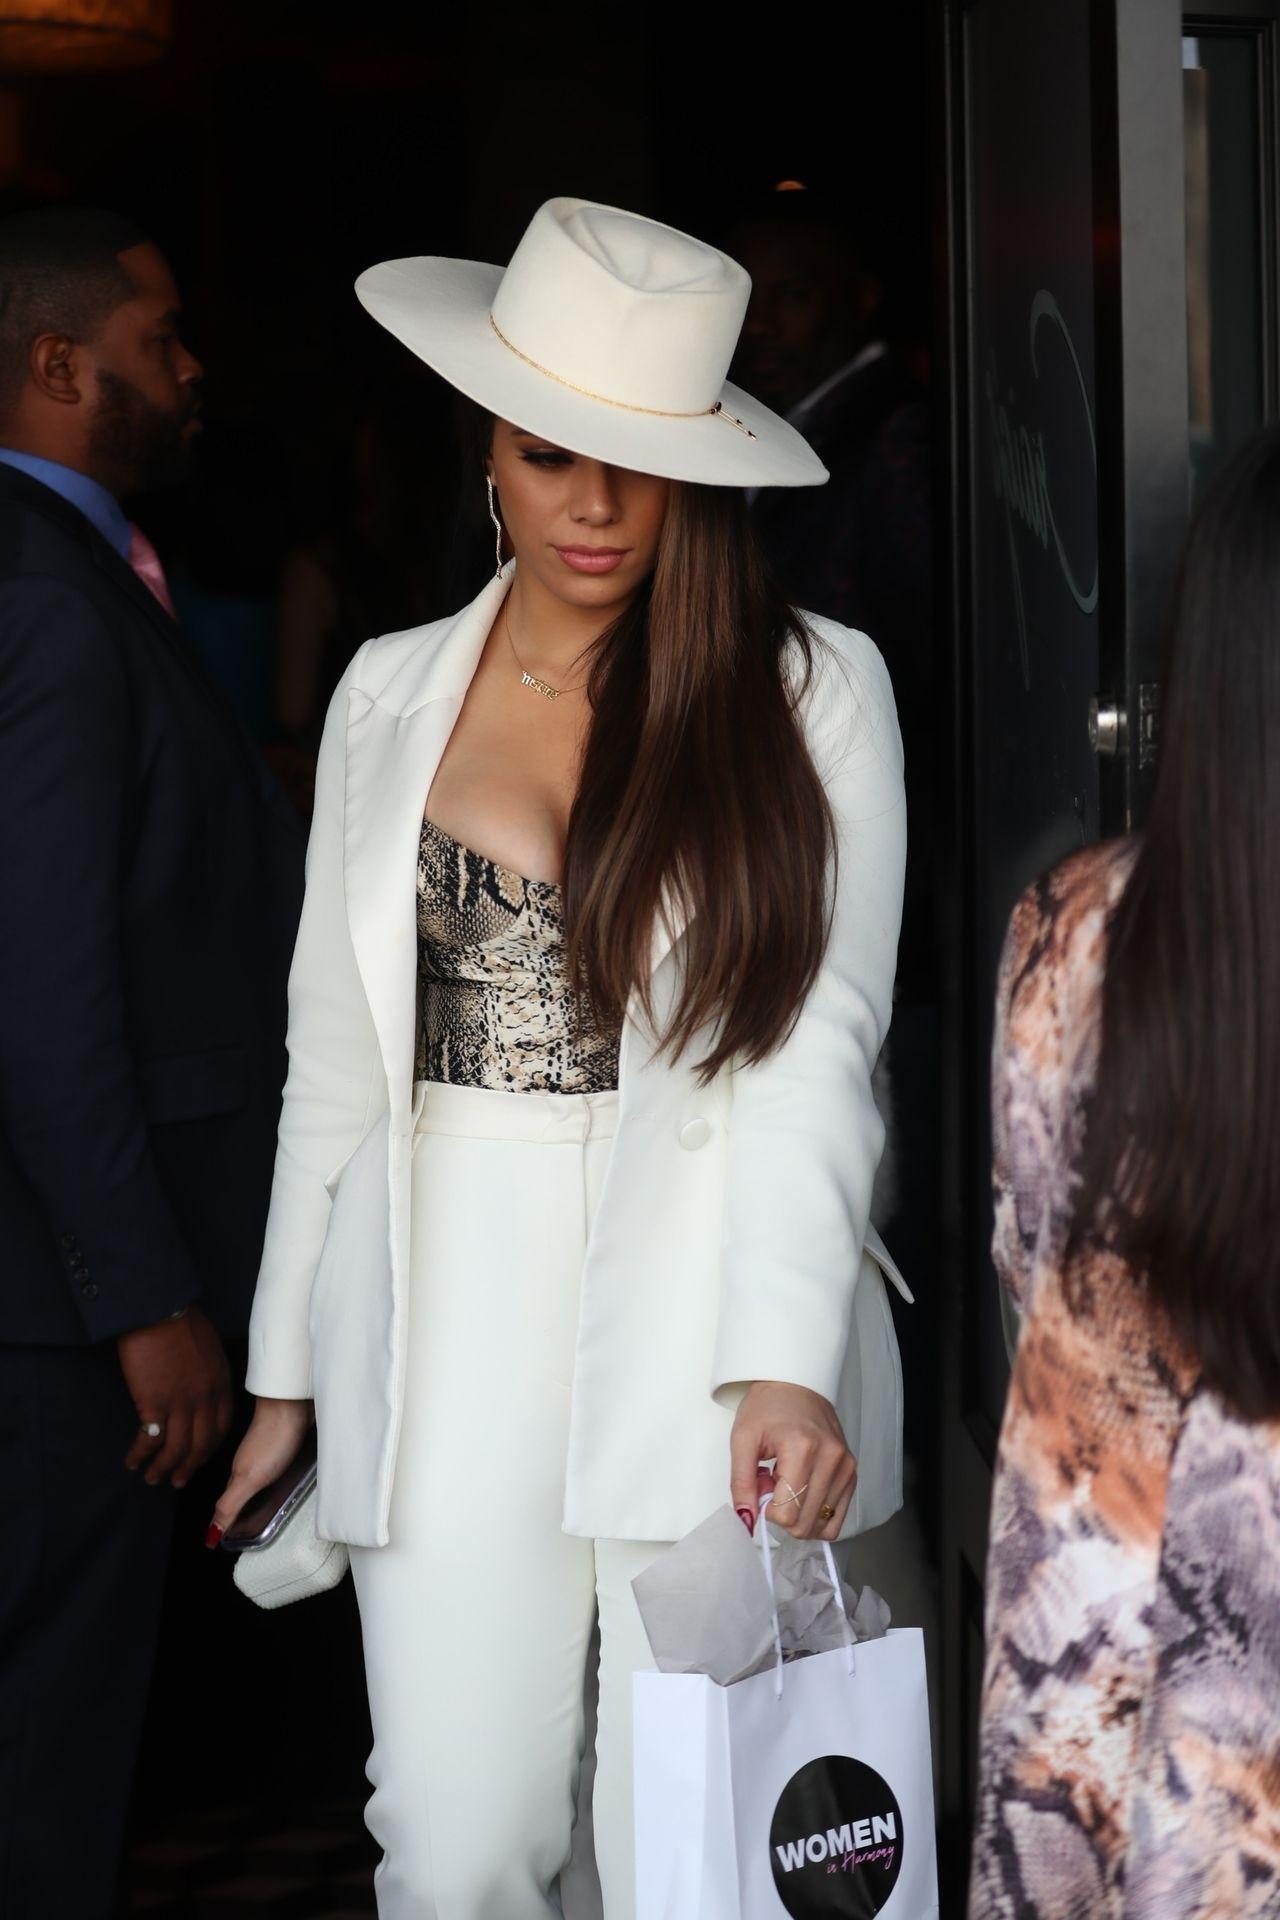 Dinah Jane Departs The Women In Harmony Pre Grammy Luncheon 0018